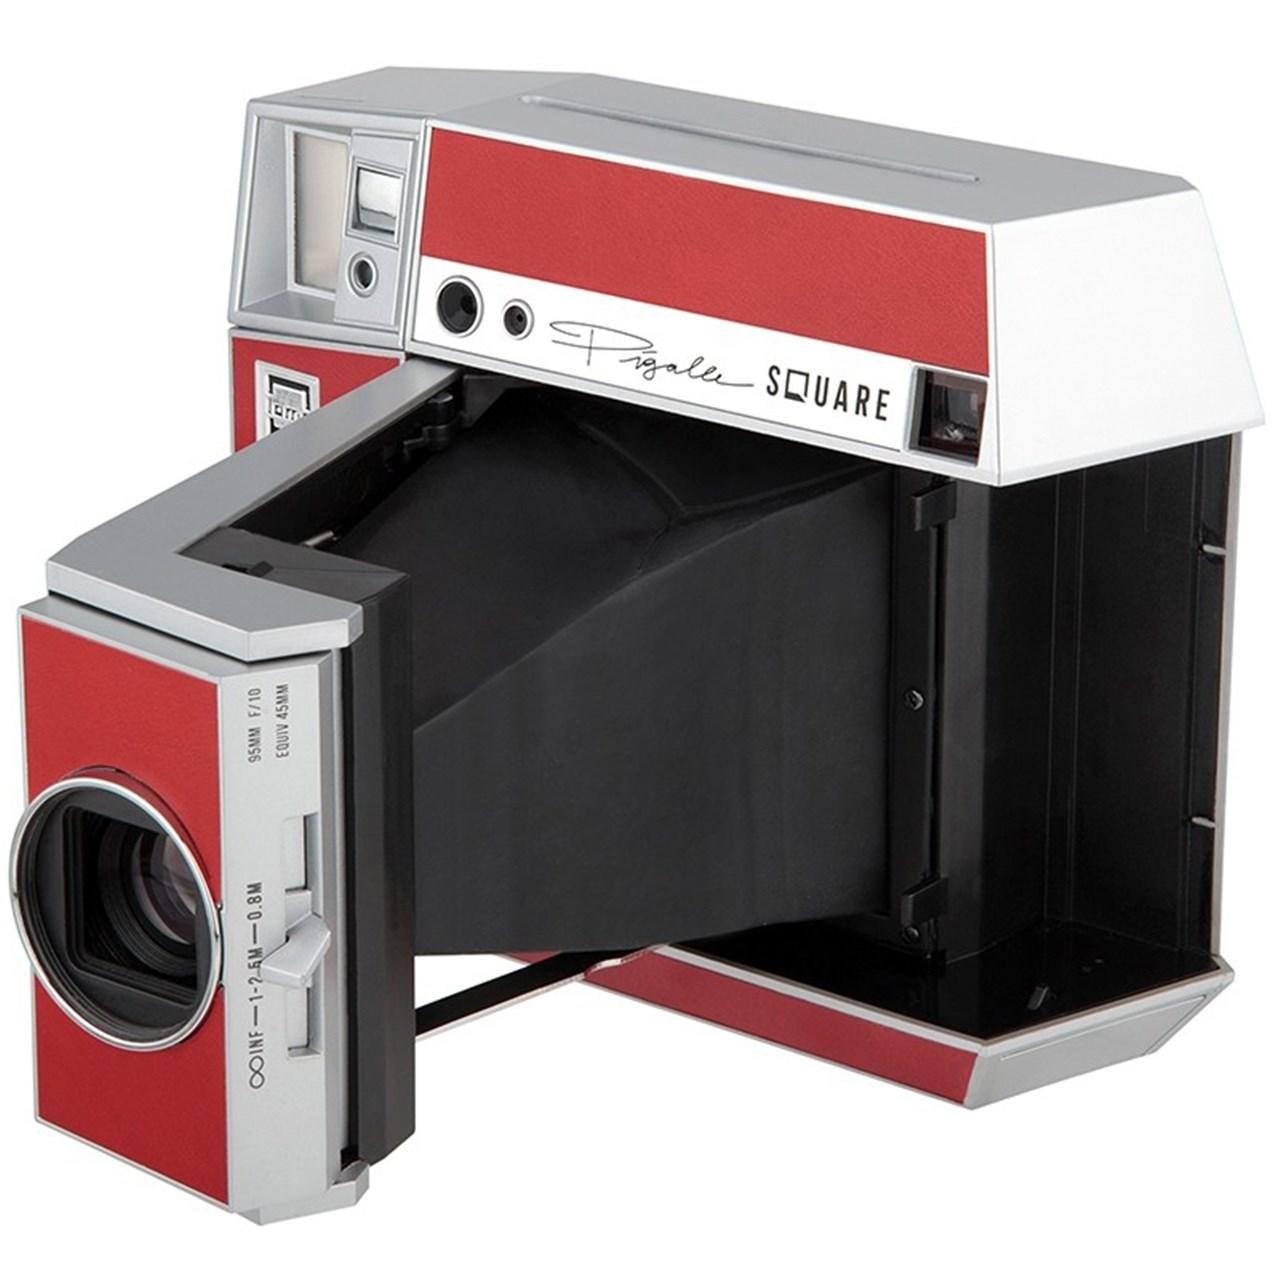 دوربین چاپ سریع لوموگرافی مدل Lomo Instant Square Glass سری Pigalle